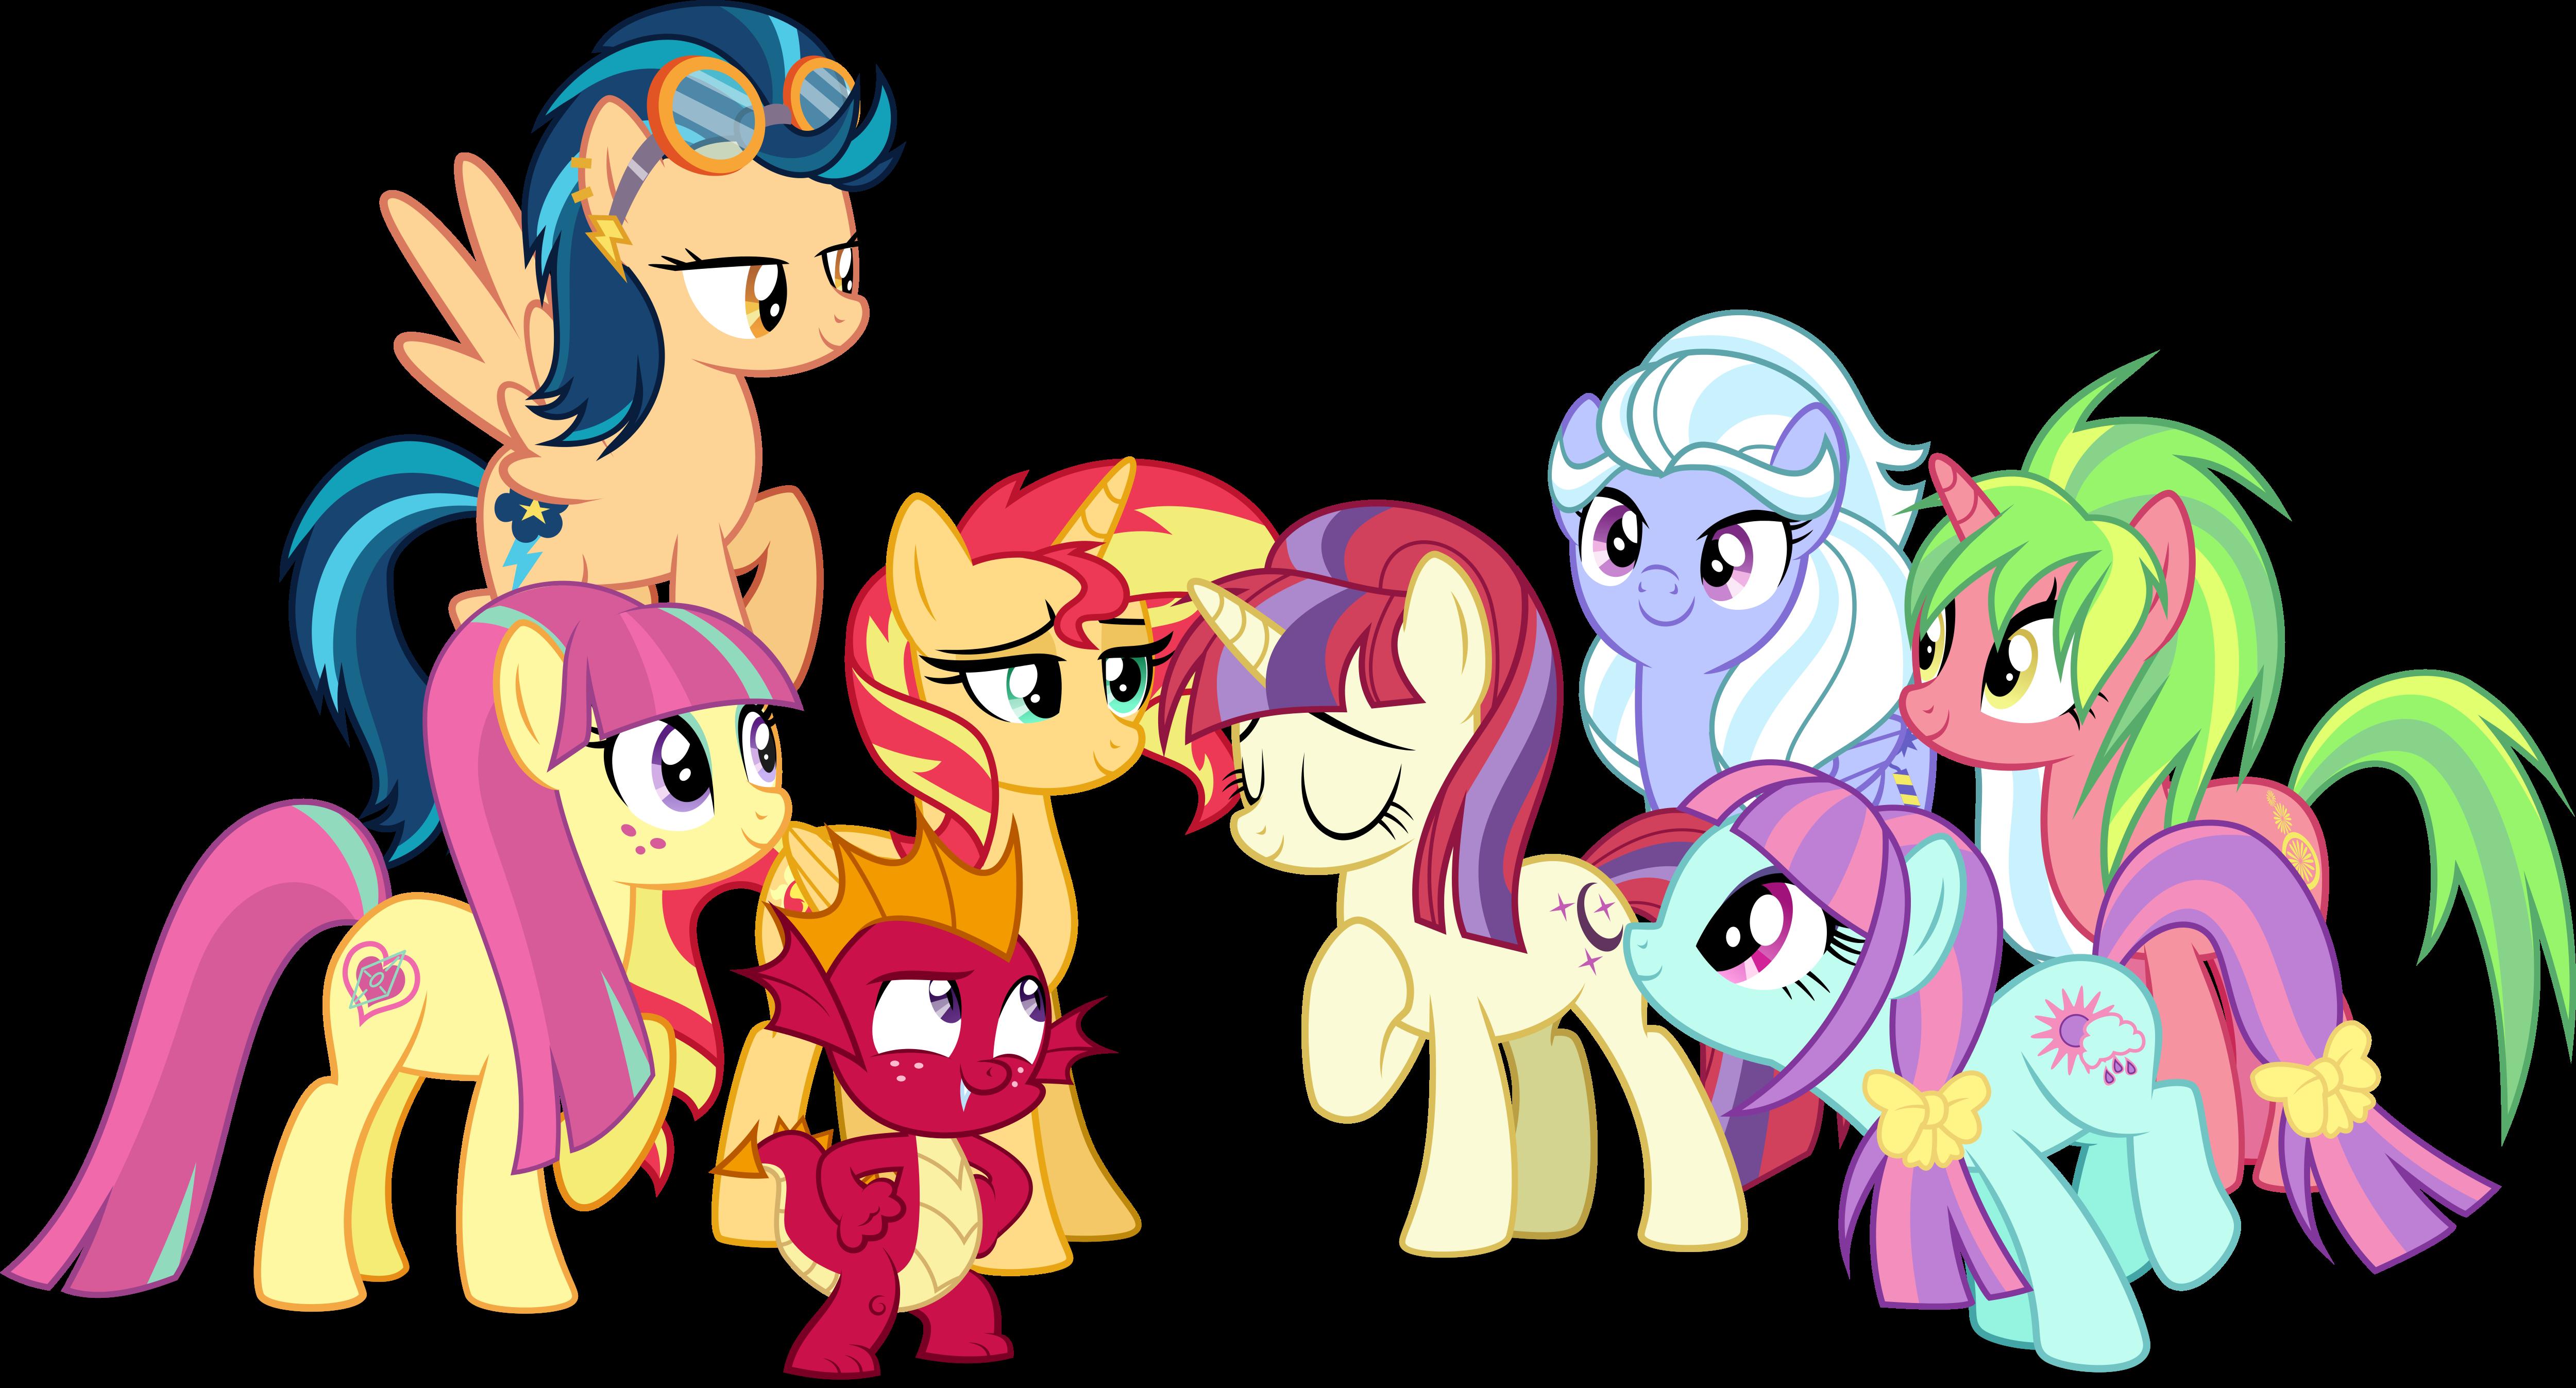 Rainbow Dash Twilight Sparkle Fluttershy Pinkie Pie Rarity Pony Spike Sunset Shimmer Cartoon Mammal Vertebrate Horse